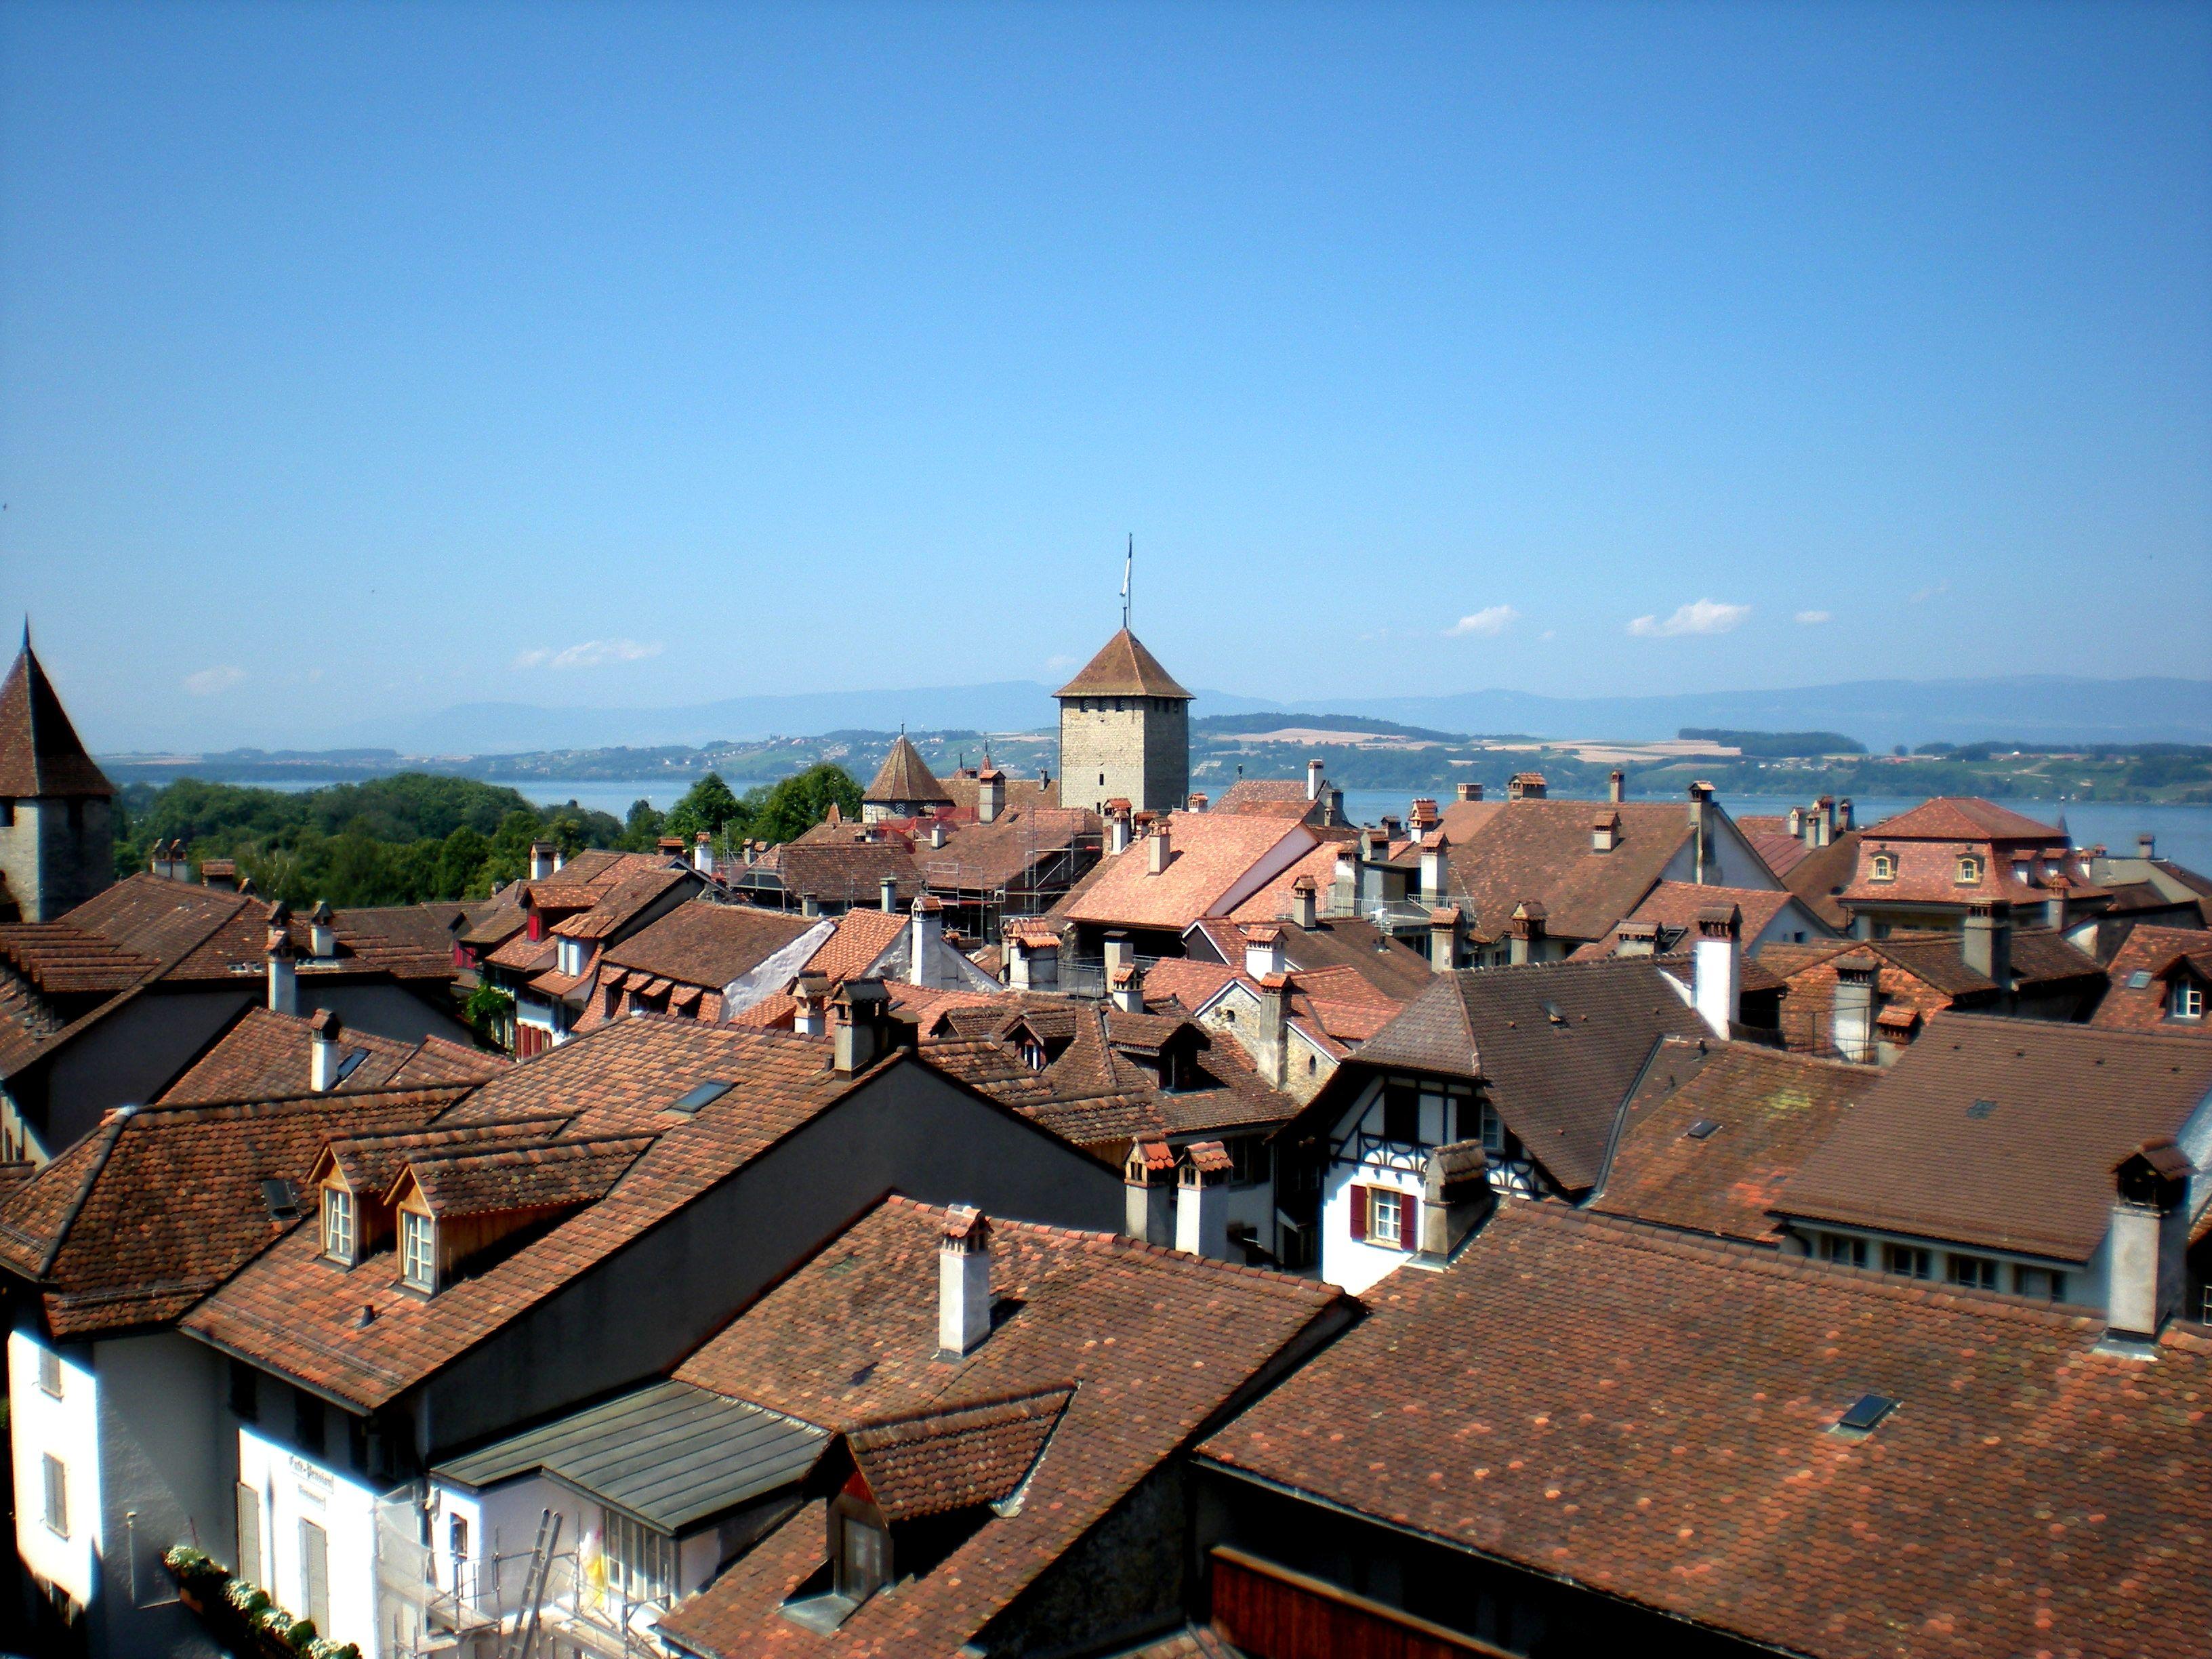 Murten Switzerland  city photos gallery : Murten Suiza . Tejados 2 Wikipedia, the free encyclopedia